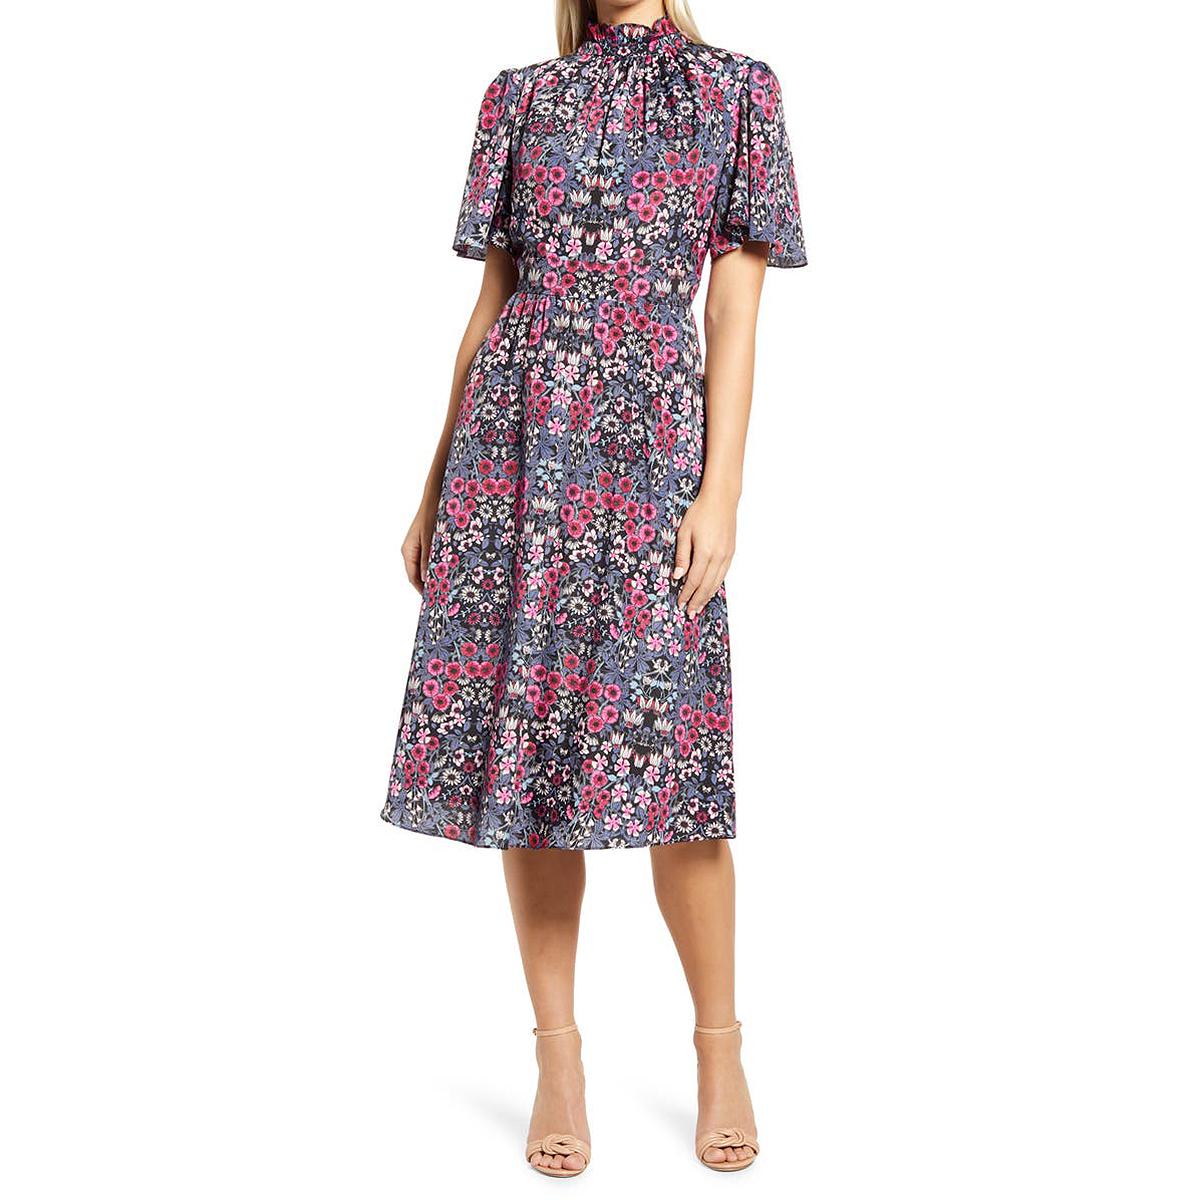 nordstrom-anniversary-sale-julia-jordan-dress